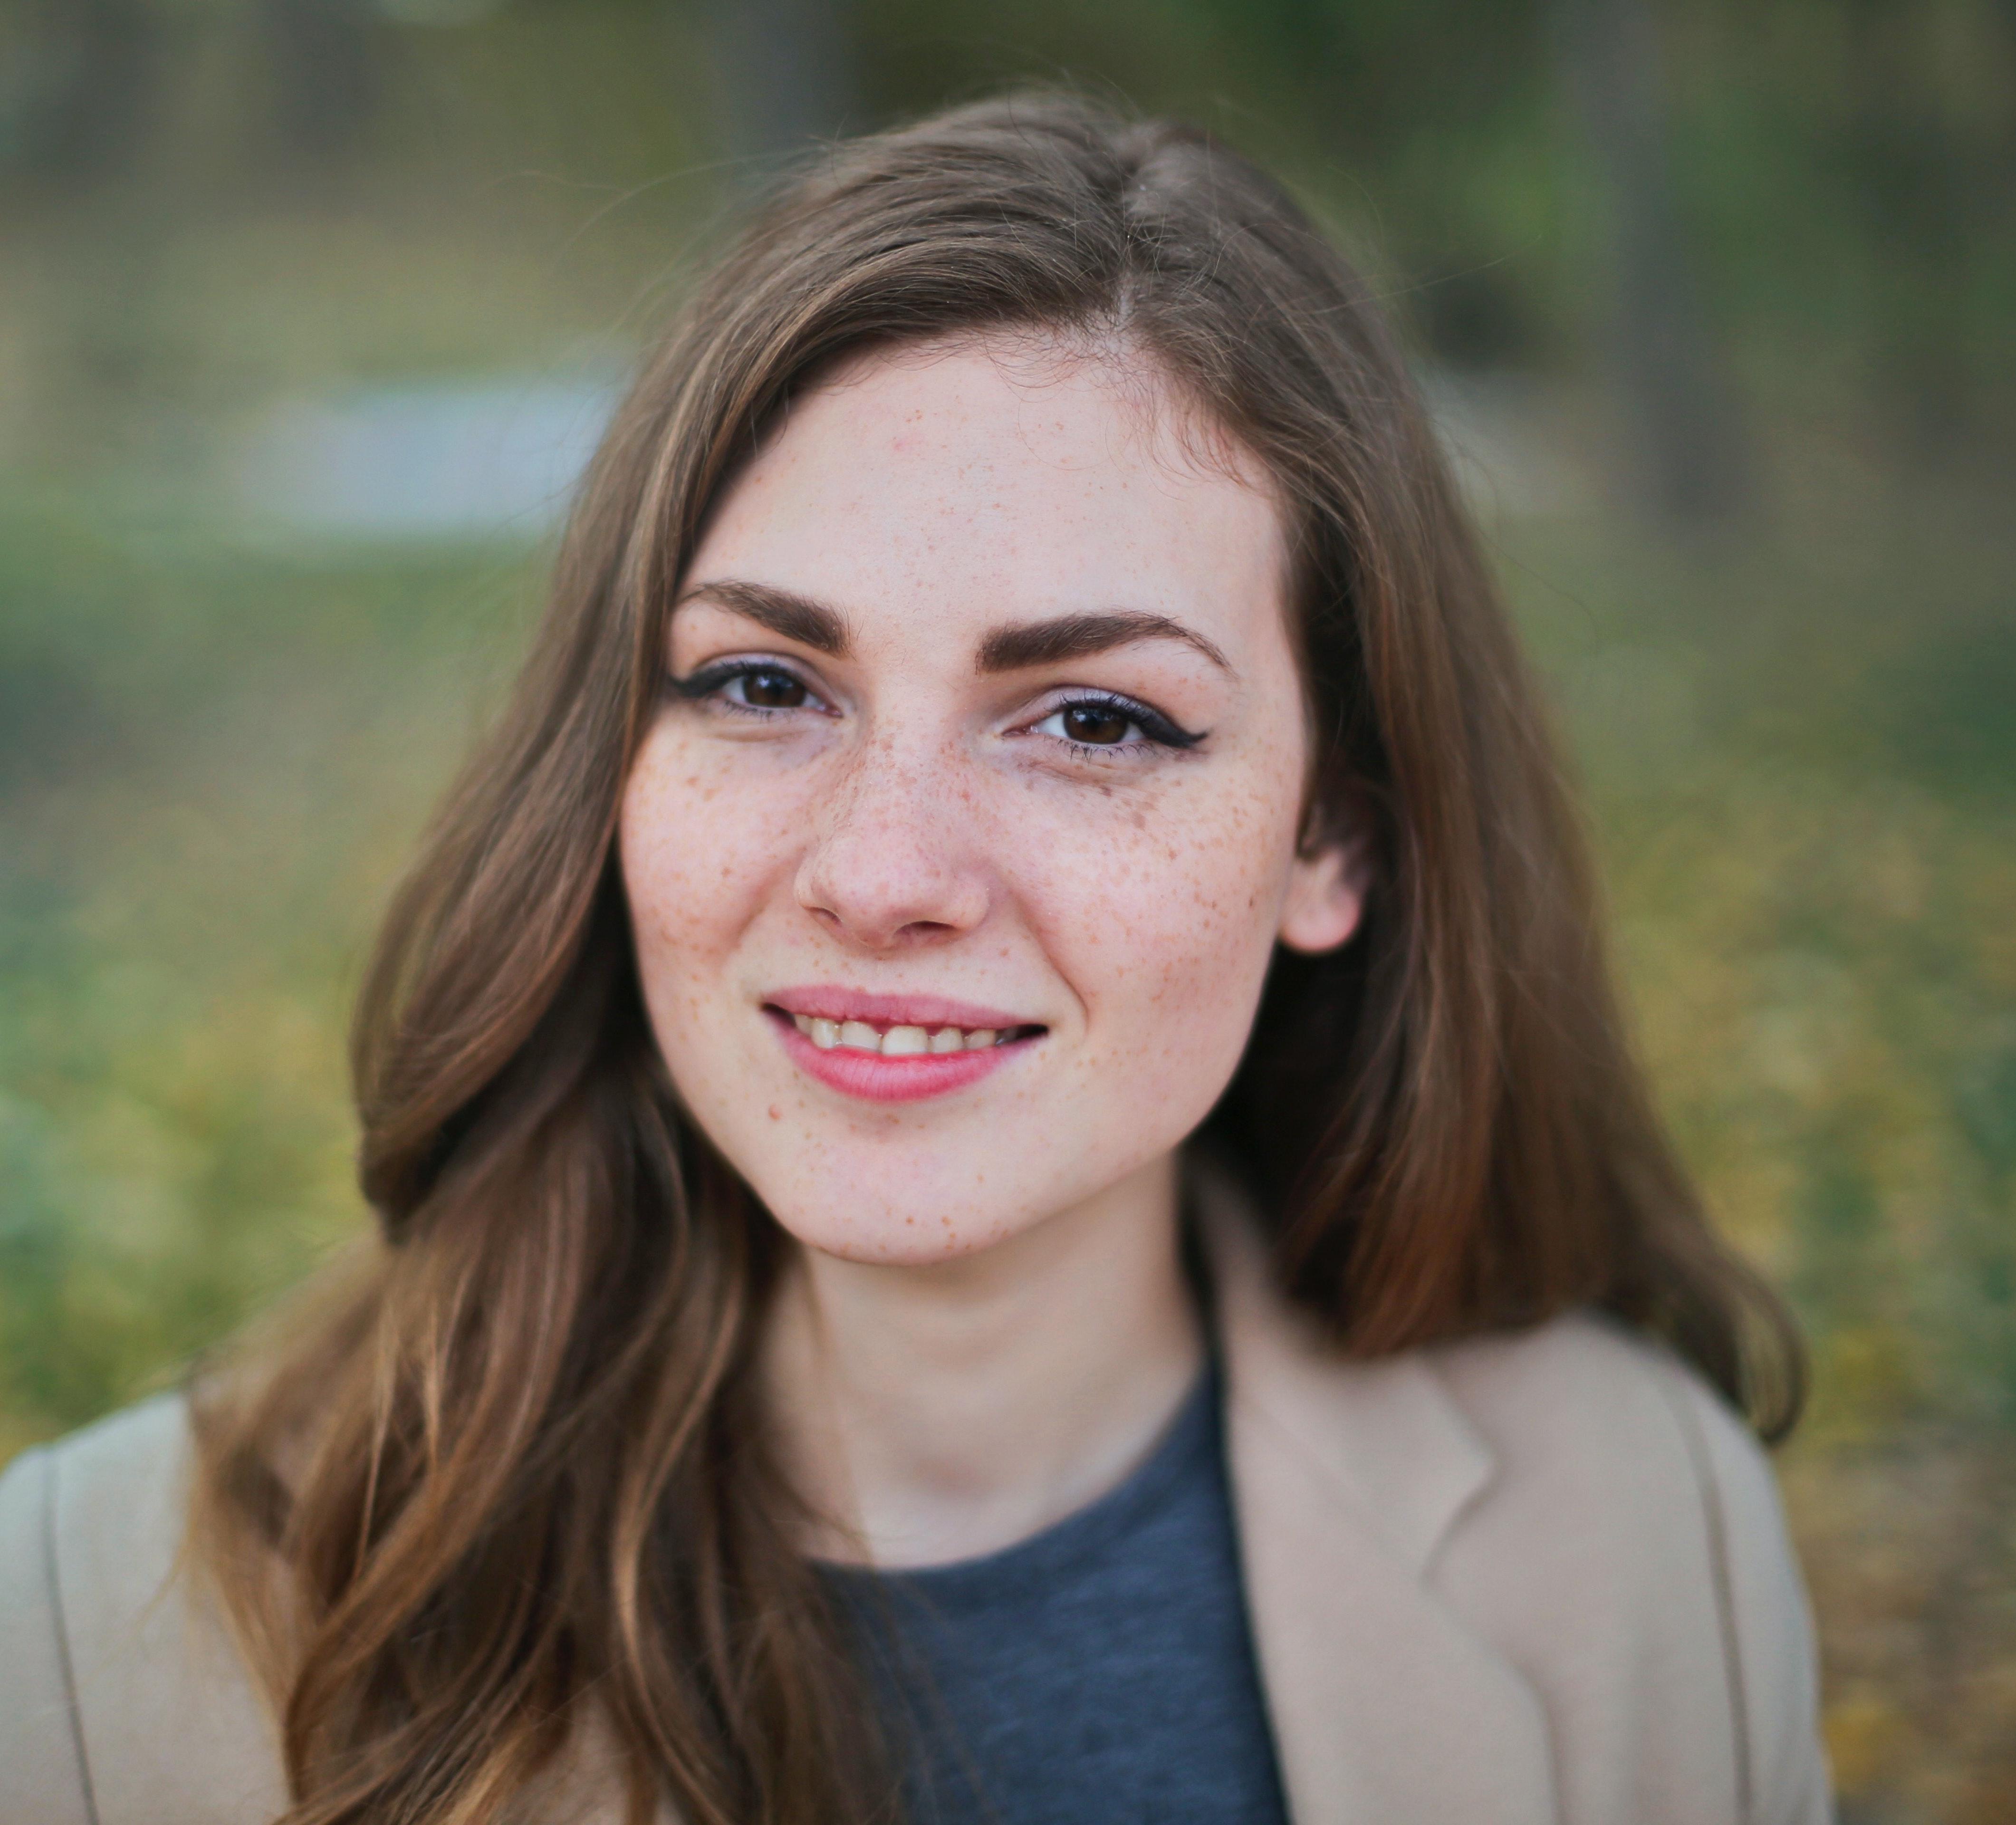 A headshot of a woman